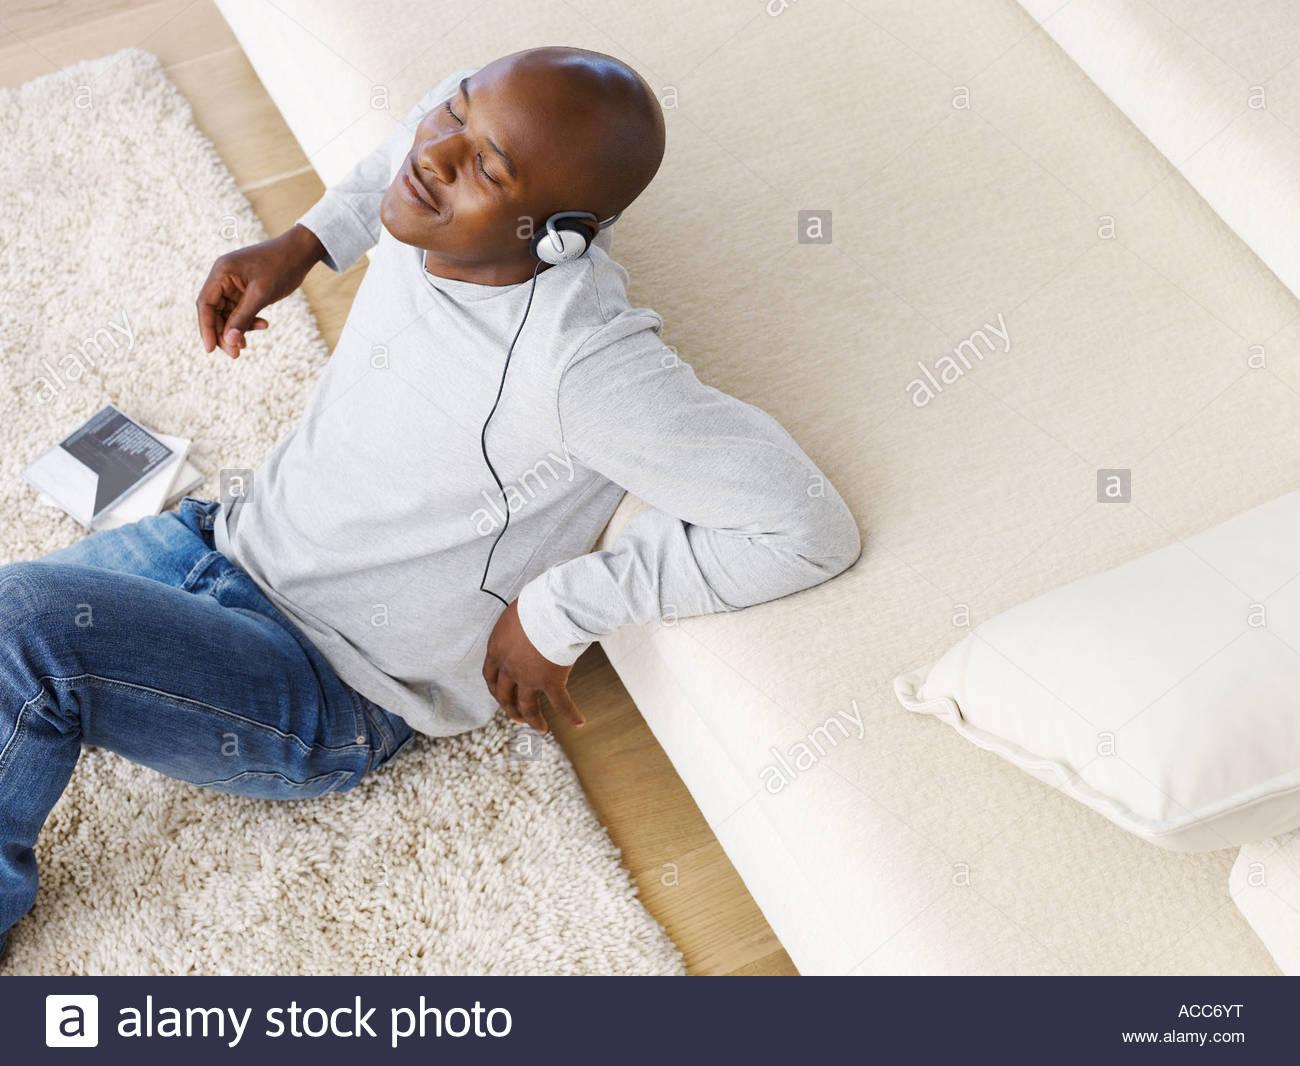 Man listening to music wearing headphones - Stock Image